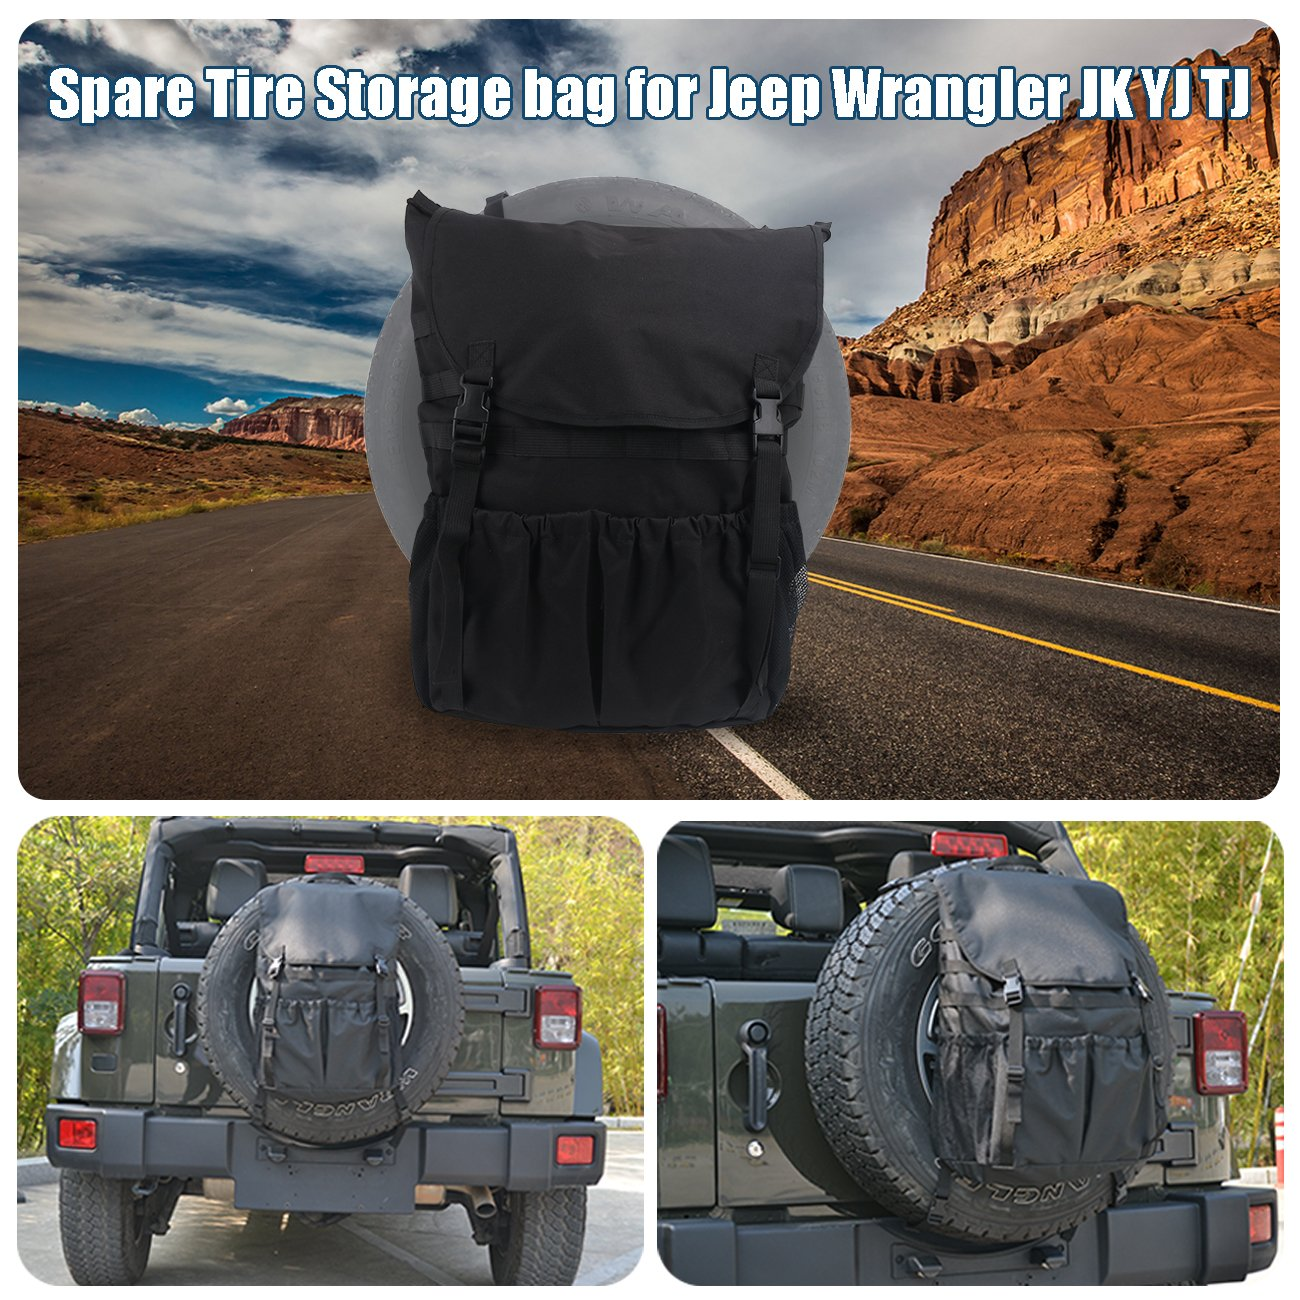 Para Wrangler JK YJTJ, bolsa de almacenamiento, organizador de mochila, organizador de maletero plegable.: Amazon.es: Coche y moto